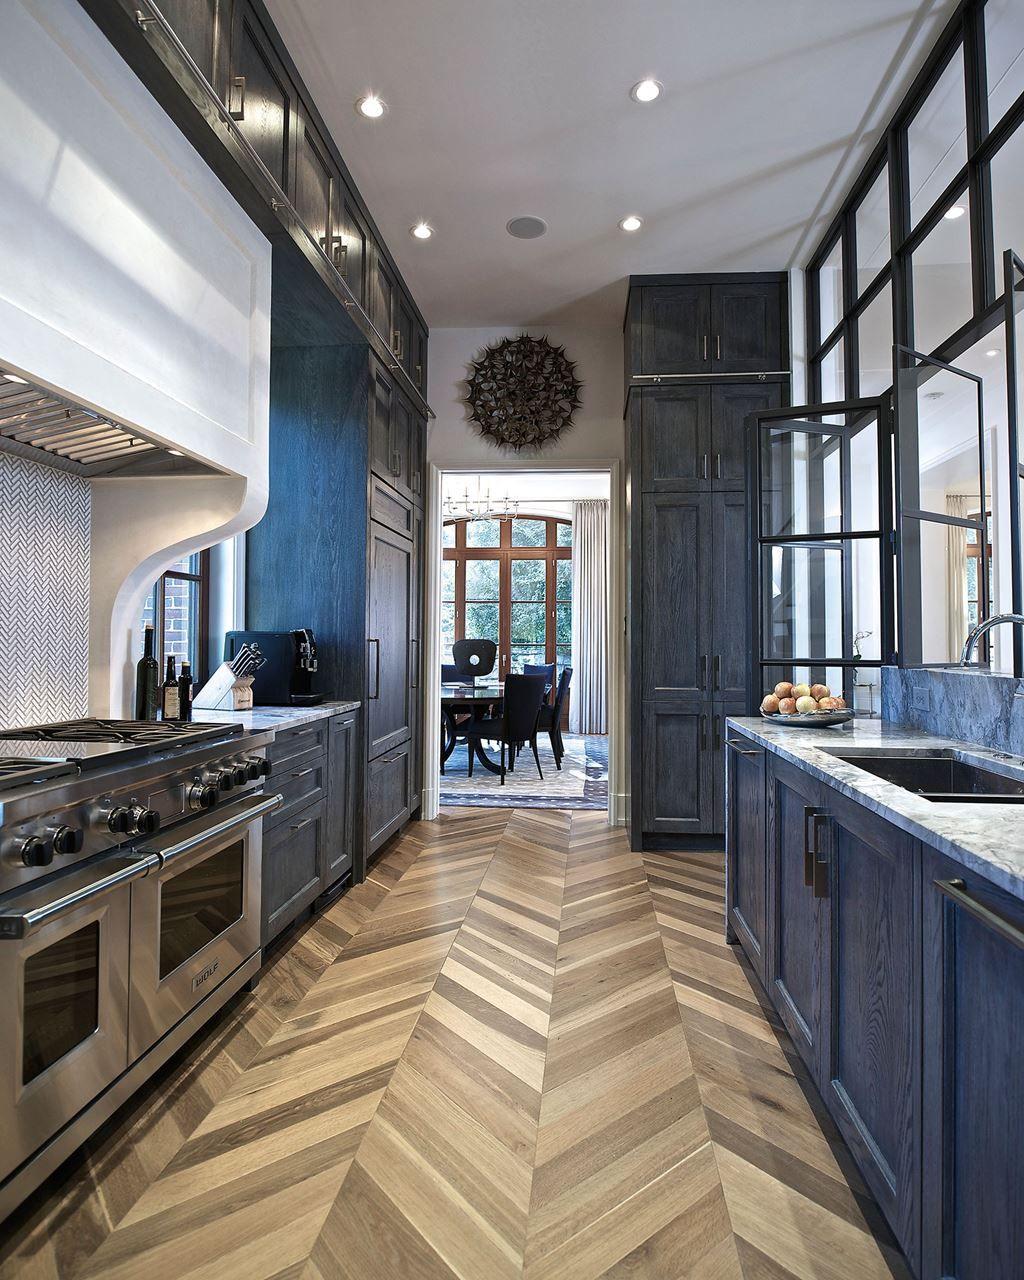 Kitchen Countertops Eugene Oregon: The Prado, Lovely As Long Kicthen. Love Backsplash In